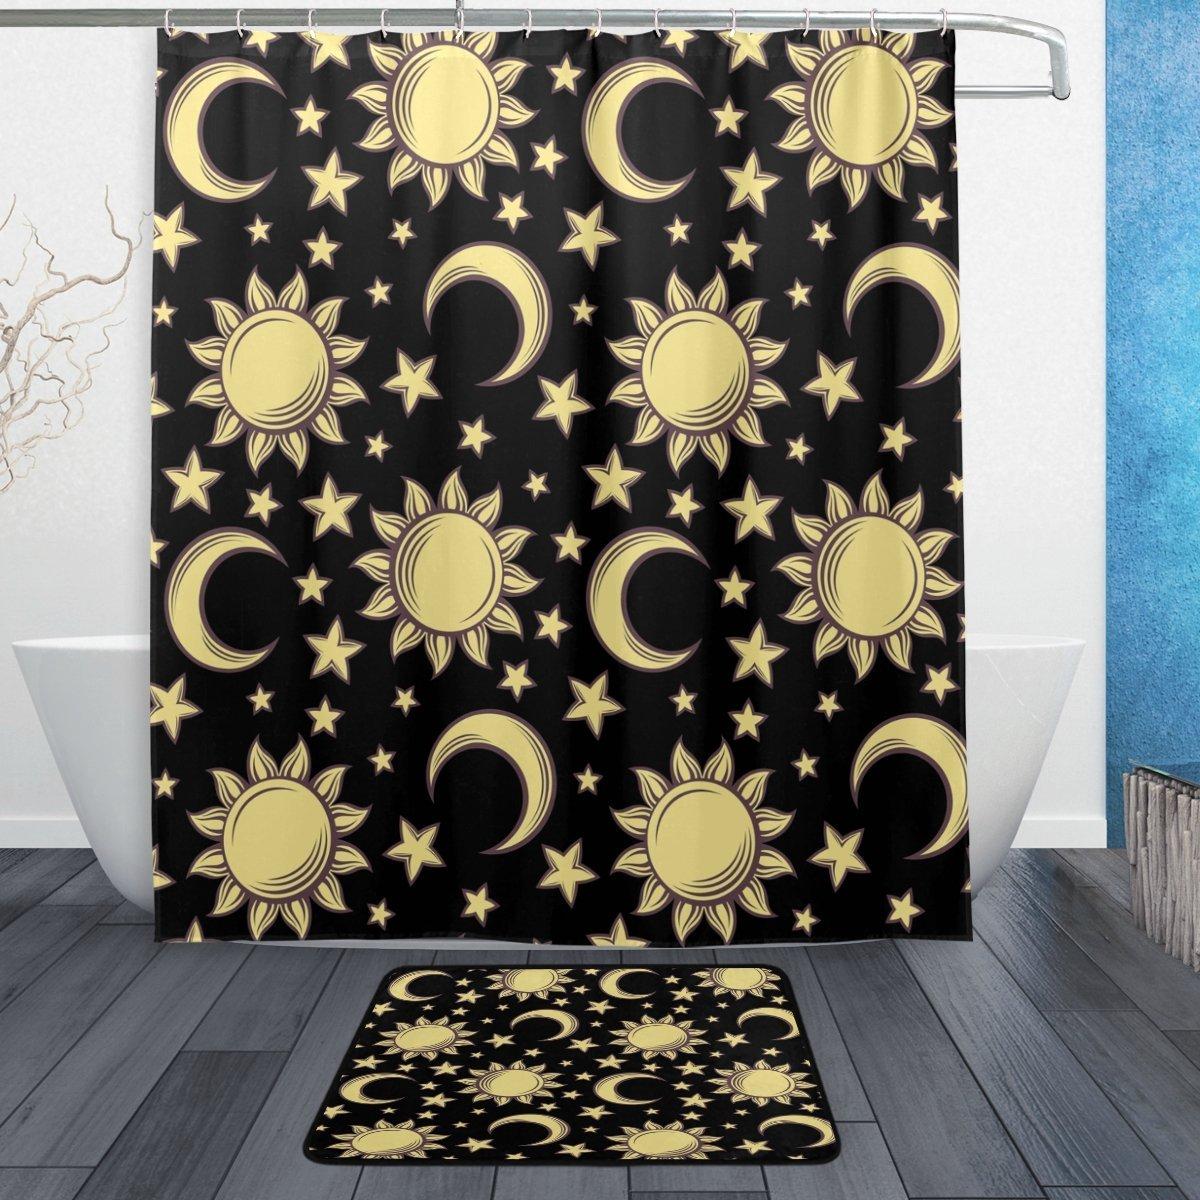 Sun Moon Star Waterproof Polyester Fabric Shower Curtain with Hooks Doormat Bath Floor Mat Bathroom Home Decor